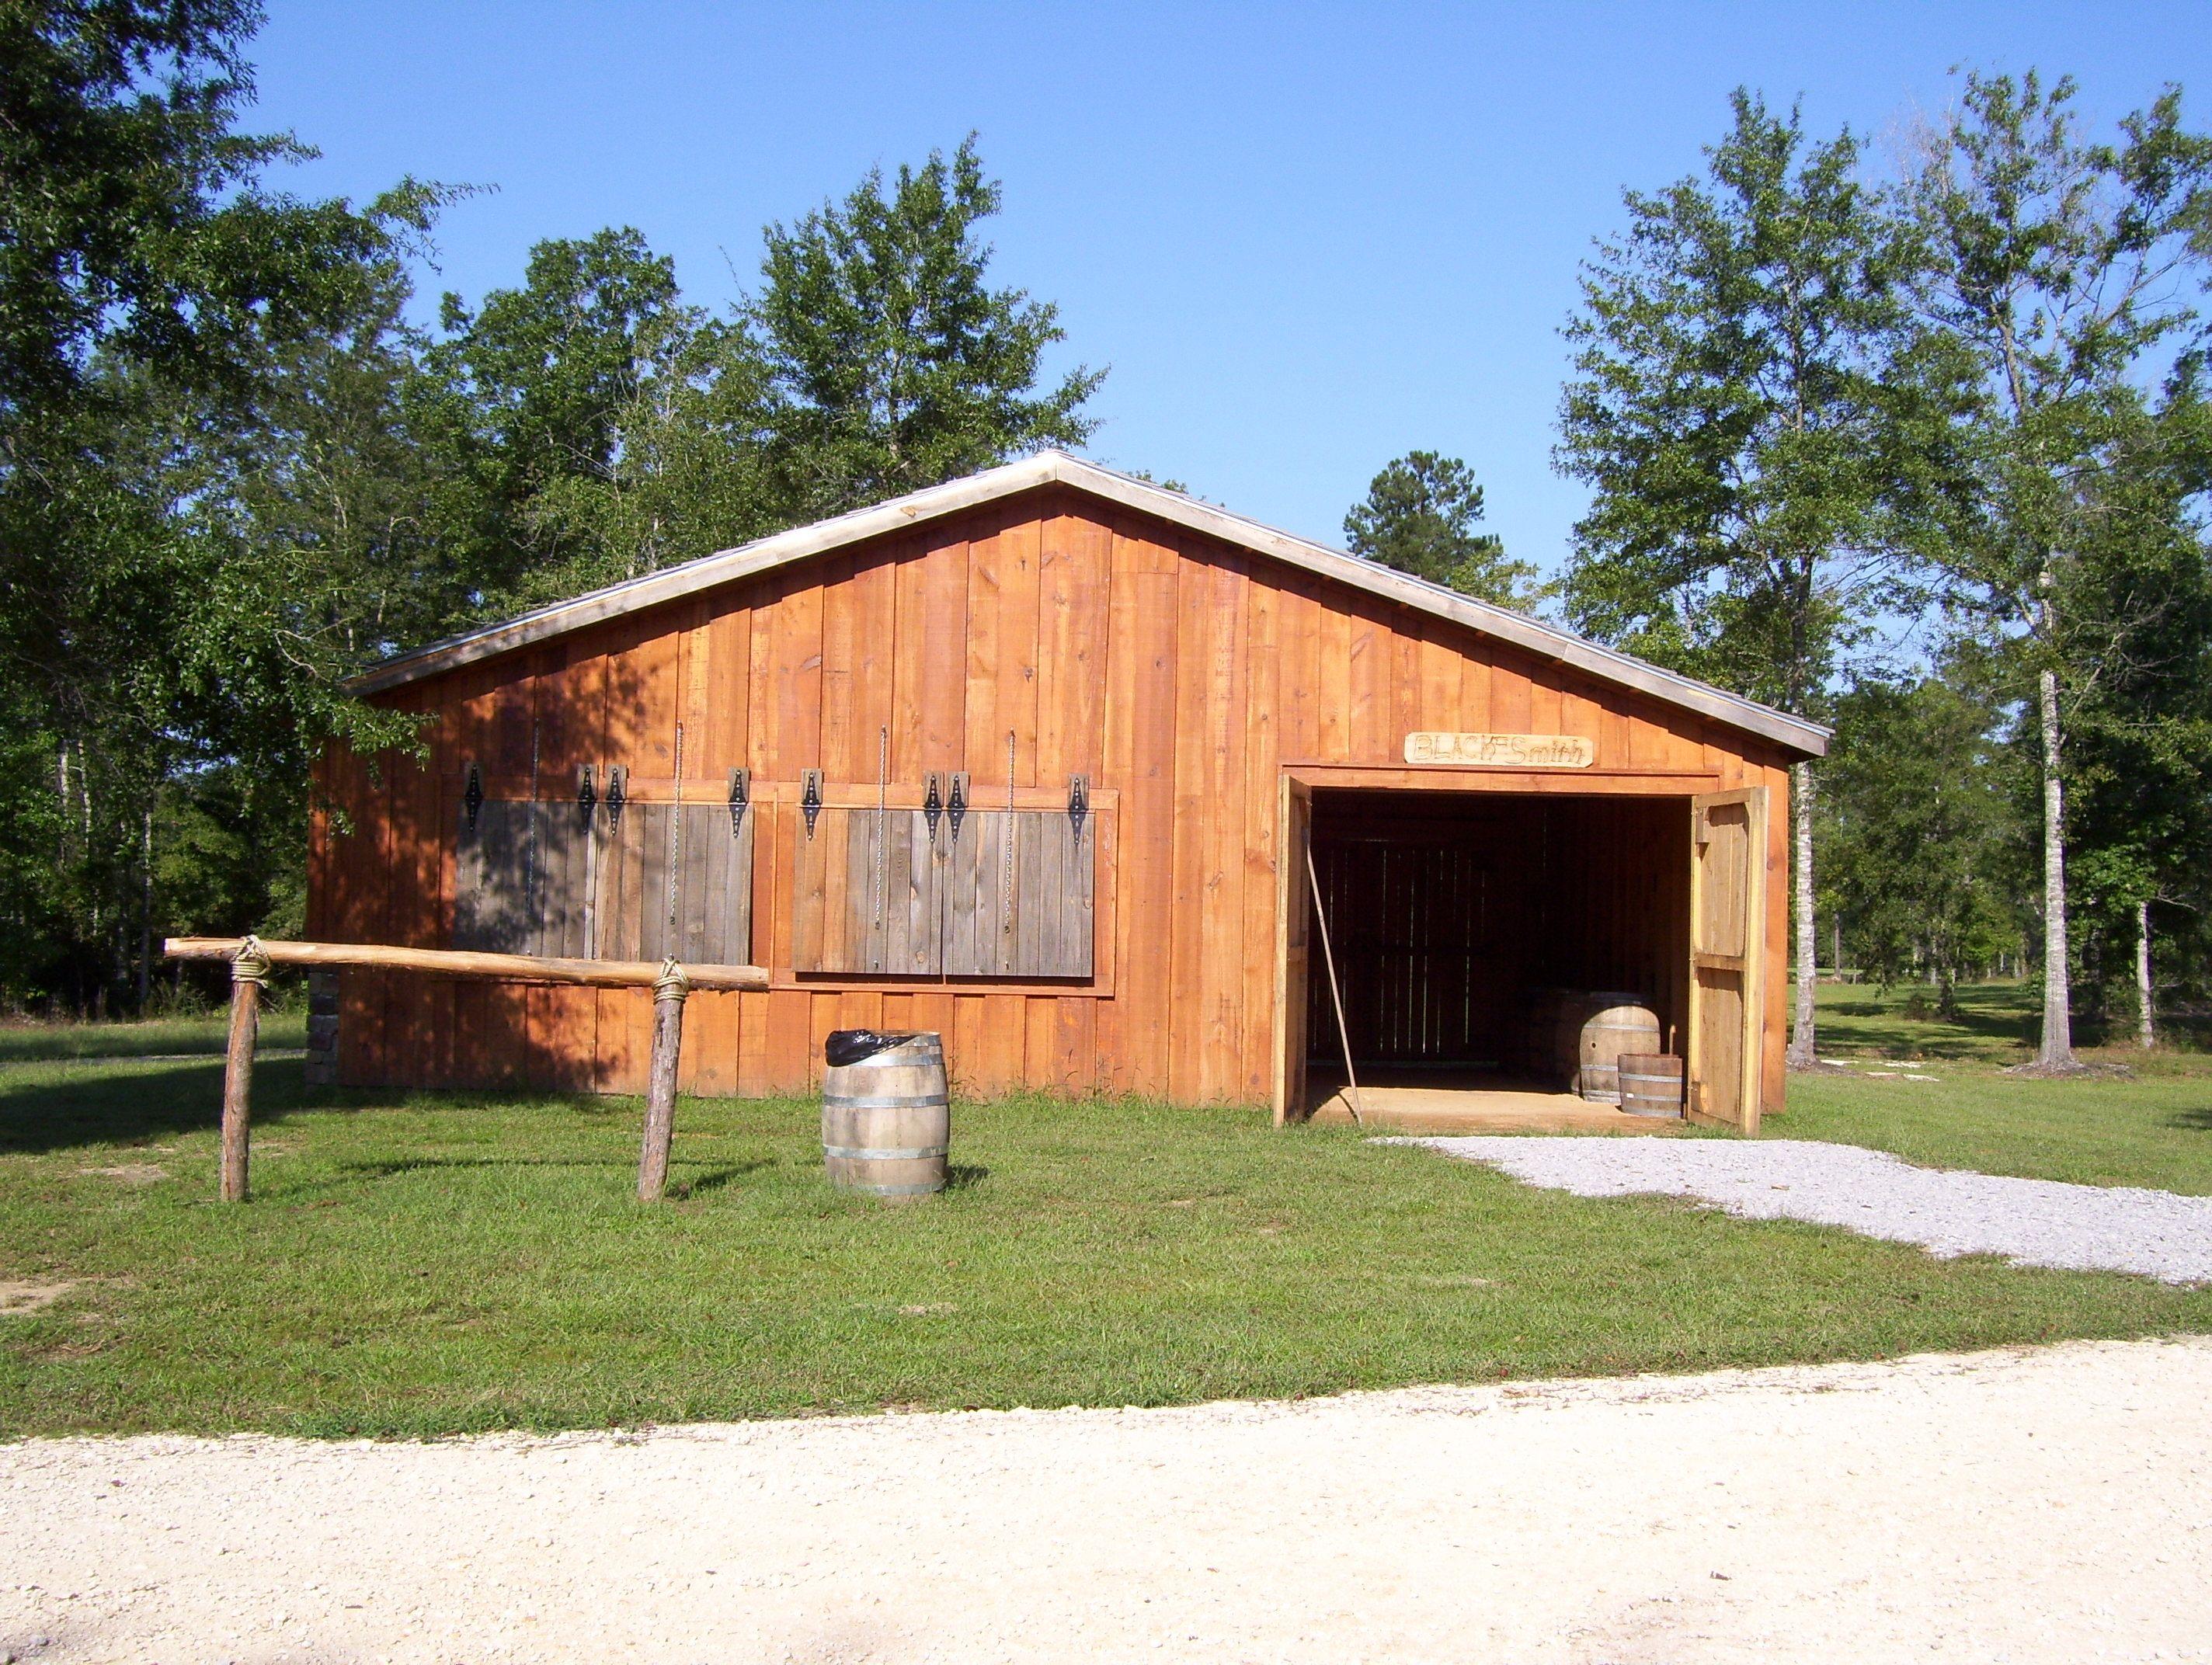 Alabama baldwin county stockton - Baldwin County Bicentennial Park Stockton Al